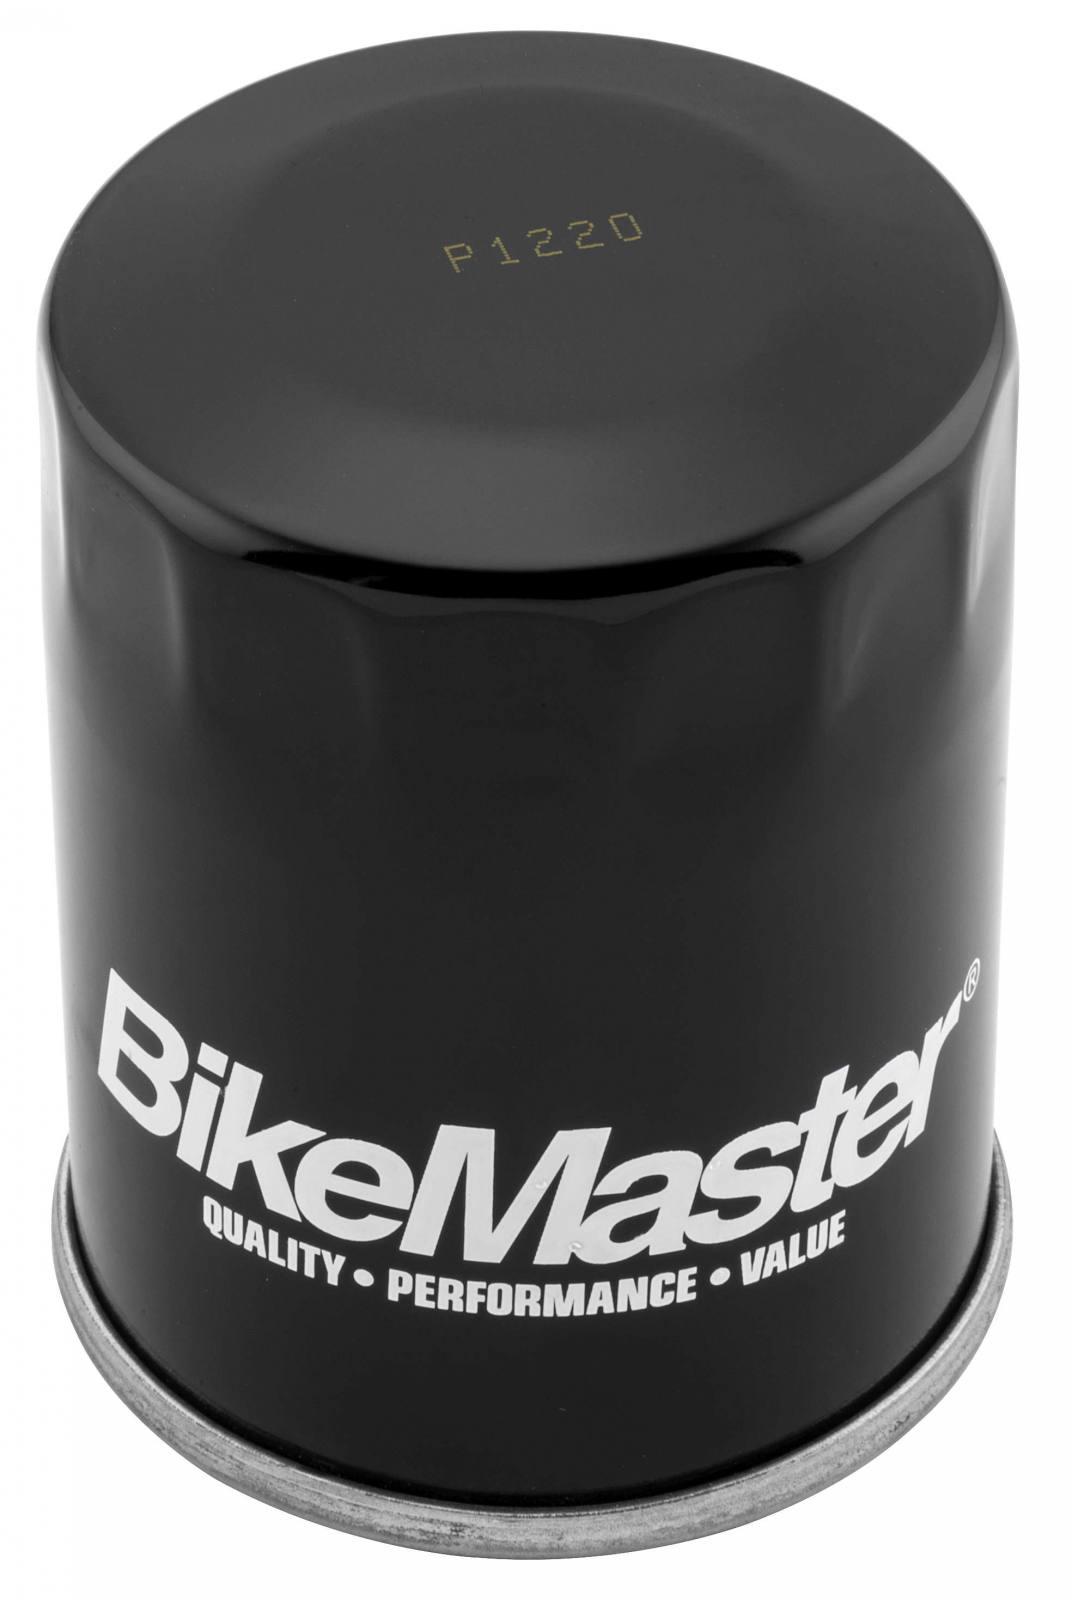 BikeMaster Oil Filter JO-M15 for Polaris Scrambler 500 2x4 2001 2002